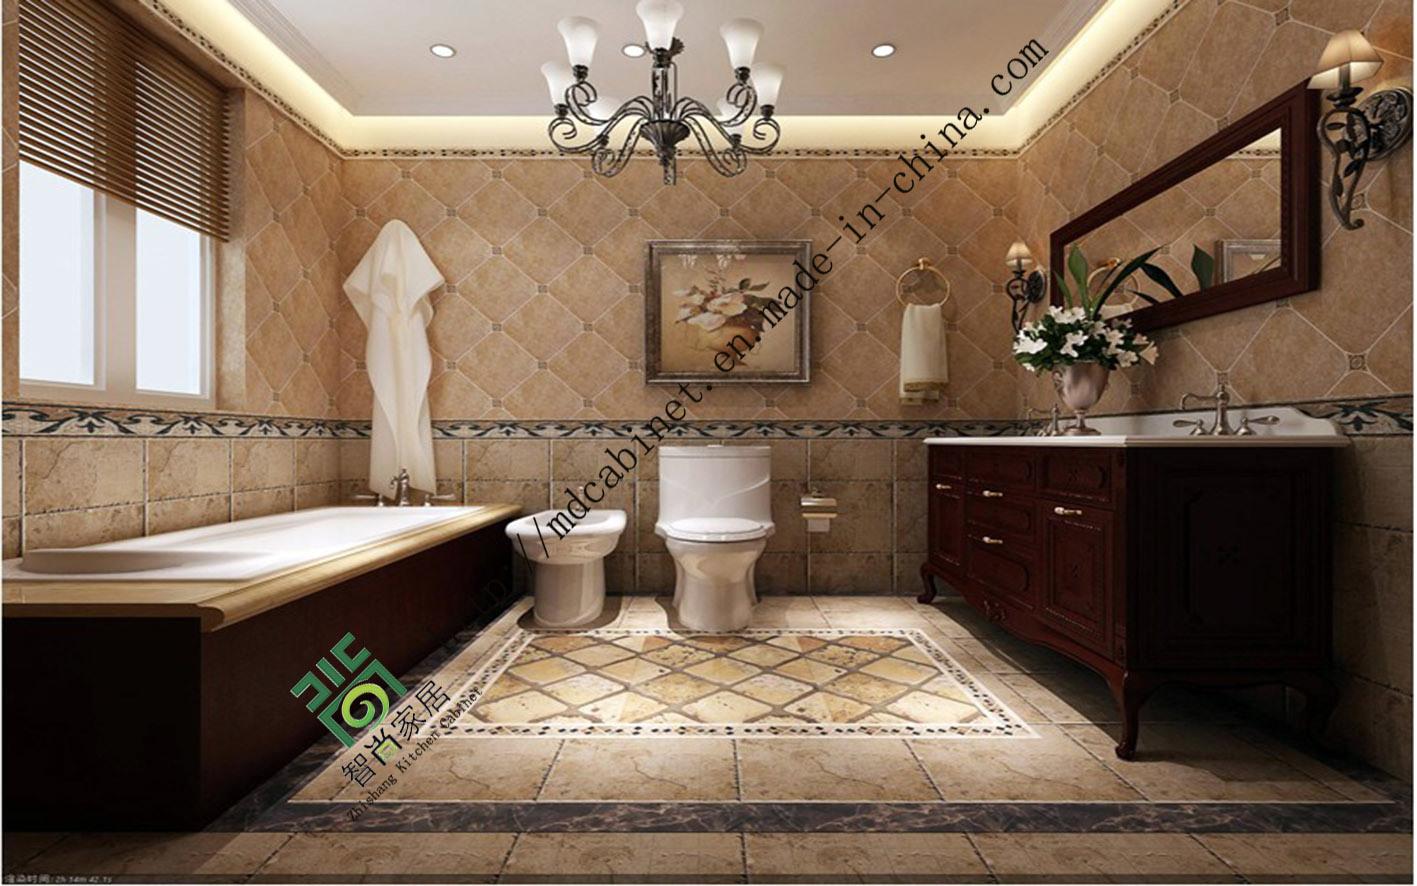 Bathroom Sink Styles : Bathroom Sink with Bathroom Sink Overflow Cover also Bathroom Sink ...